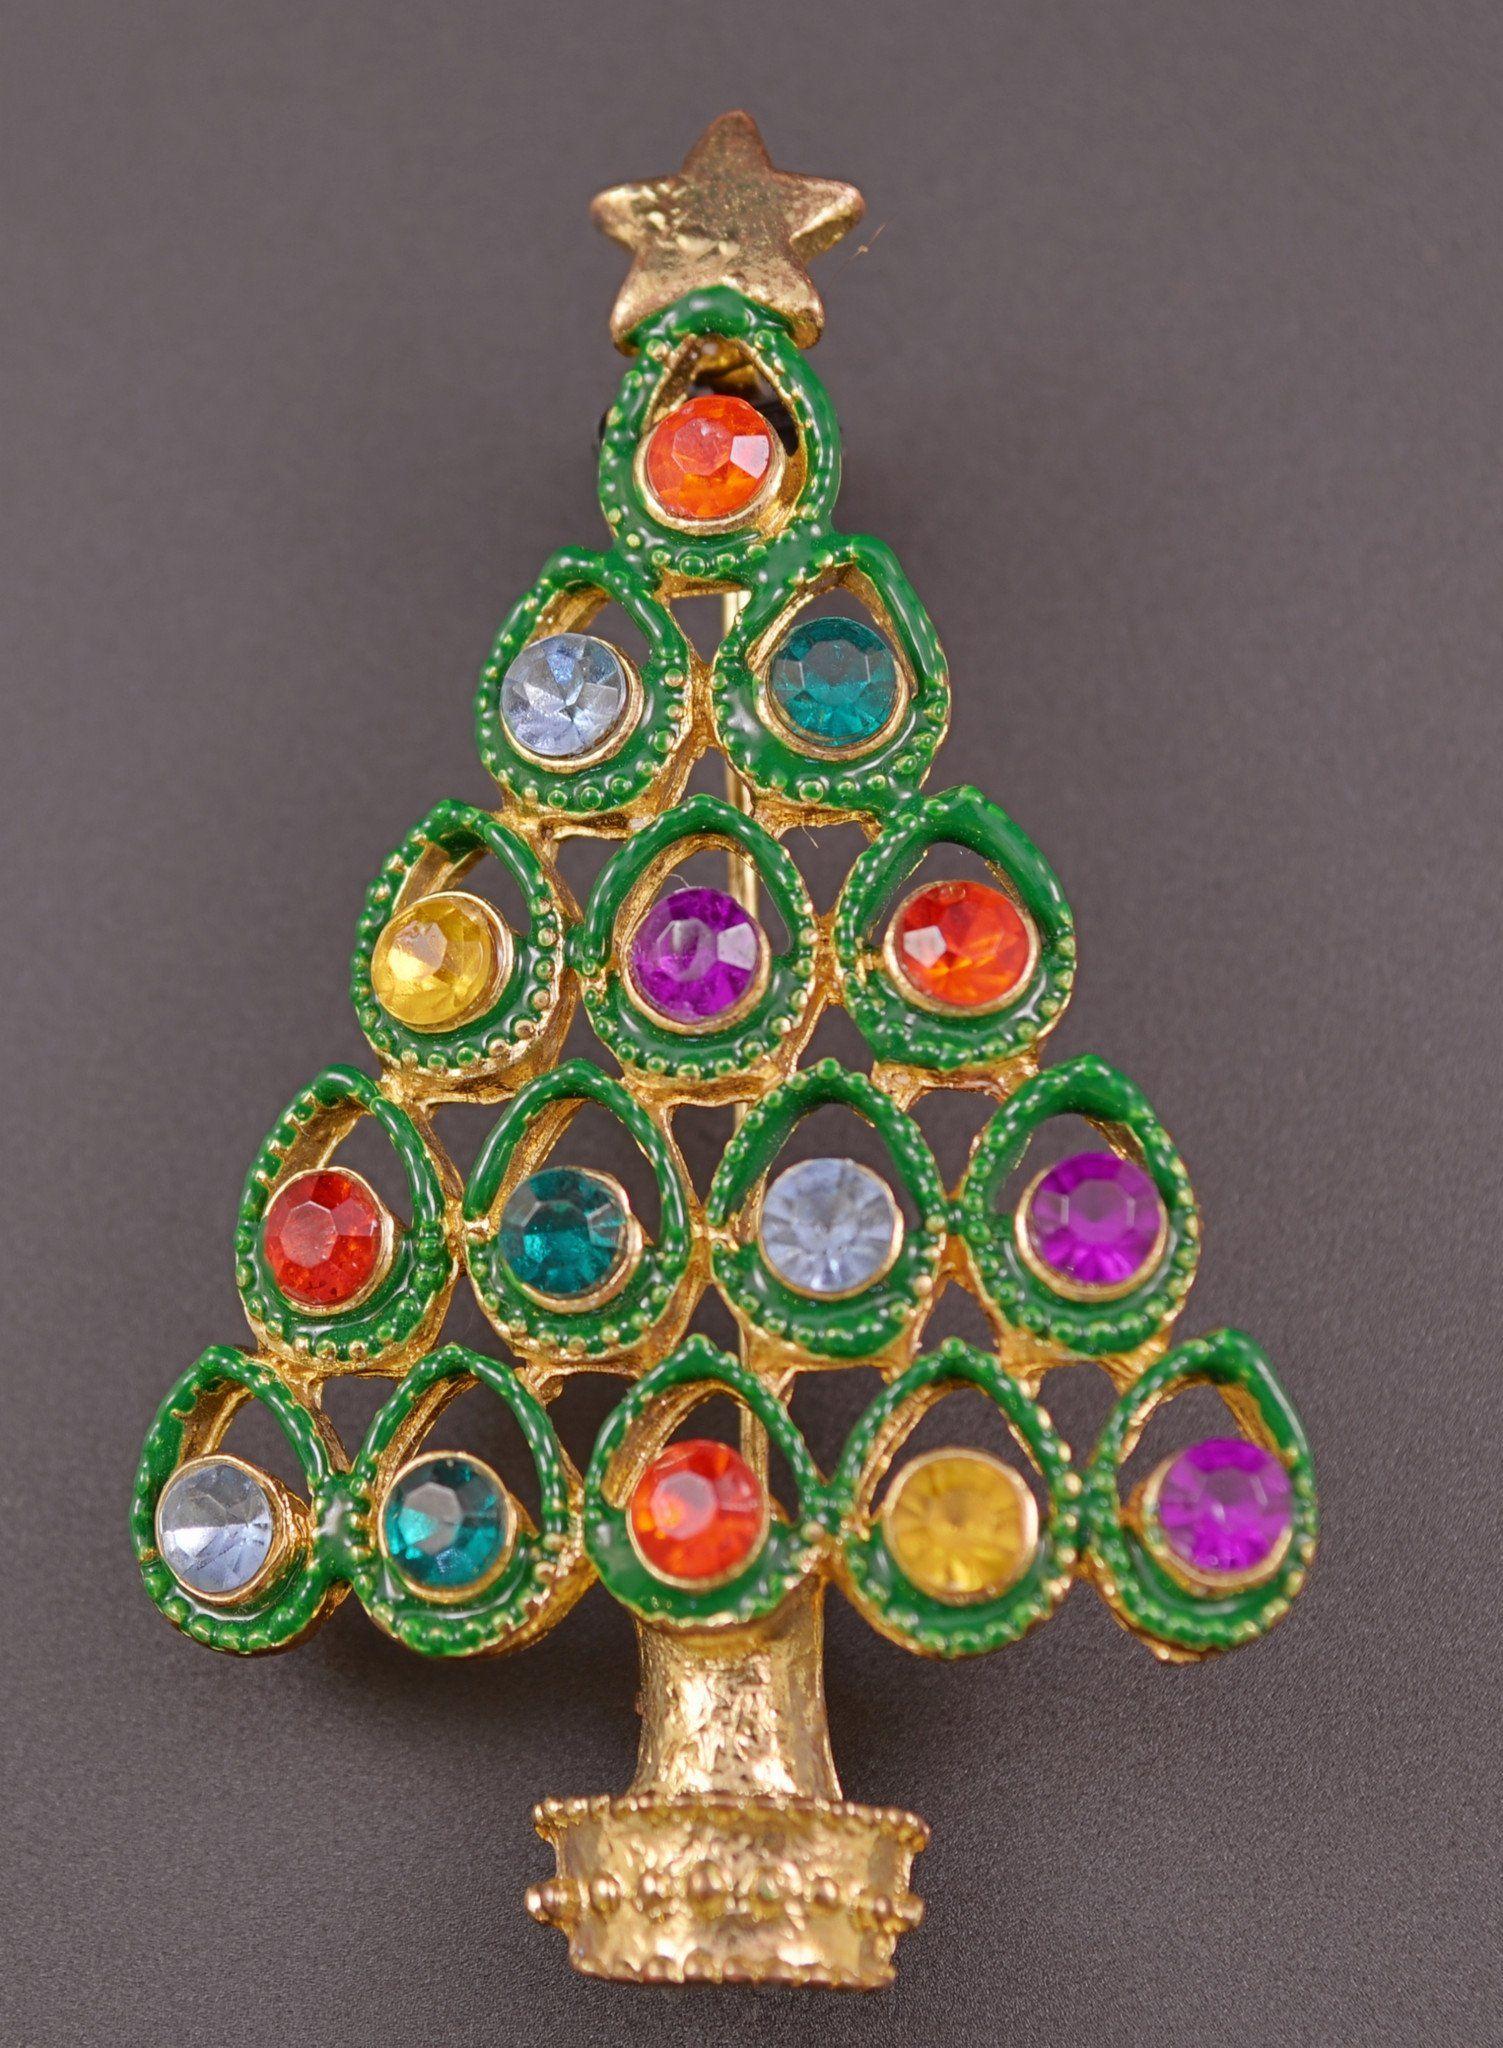 Pin De Mata Perros En X En 2019: Rhinestone Christmas Tree Pin Brooch